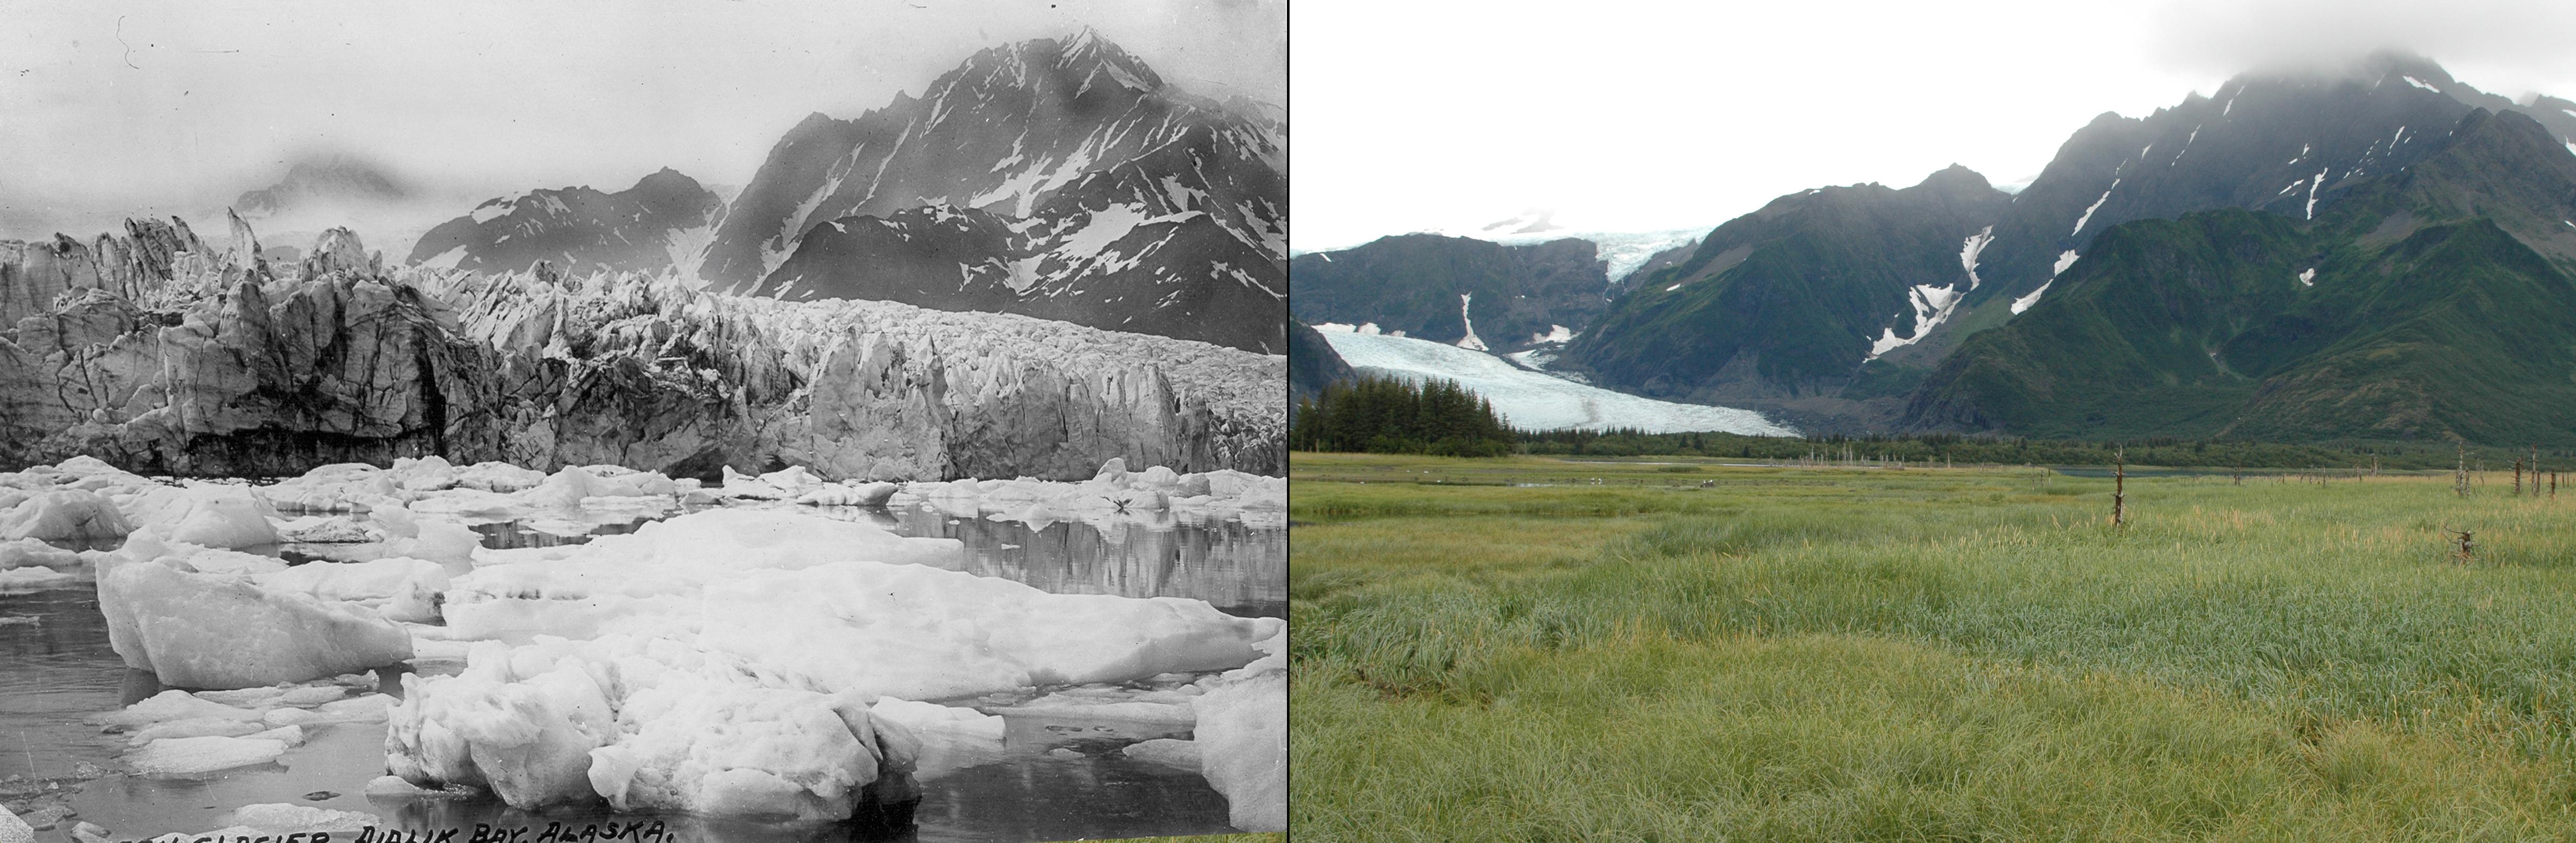 http://climate.nasa.gov/system/gallery_images/large/Icemelt_Alaska8.jpg